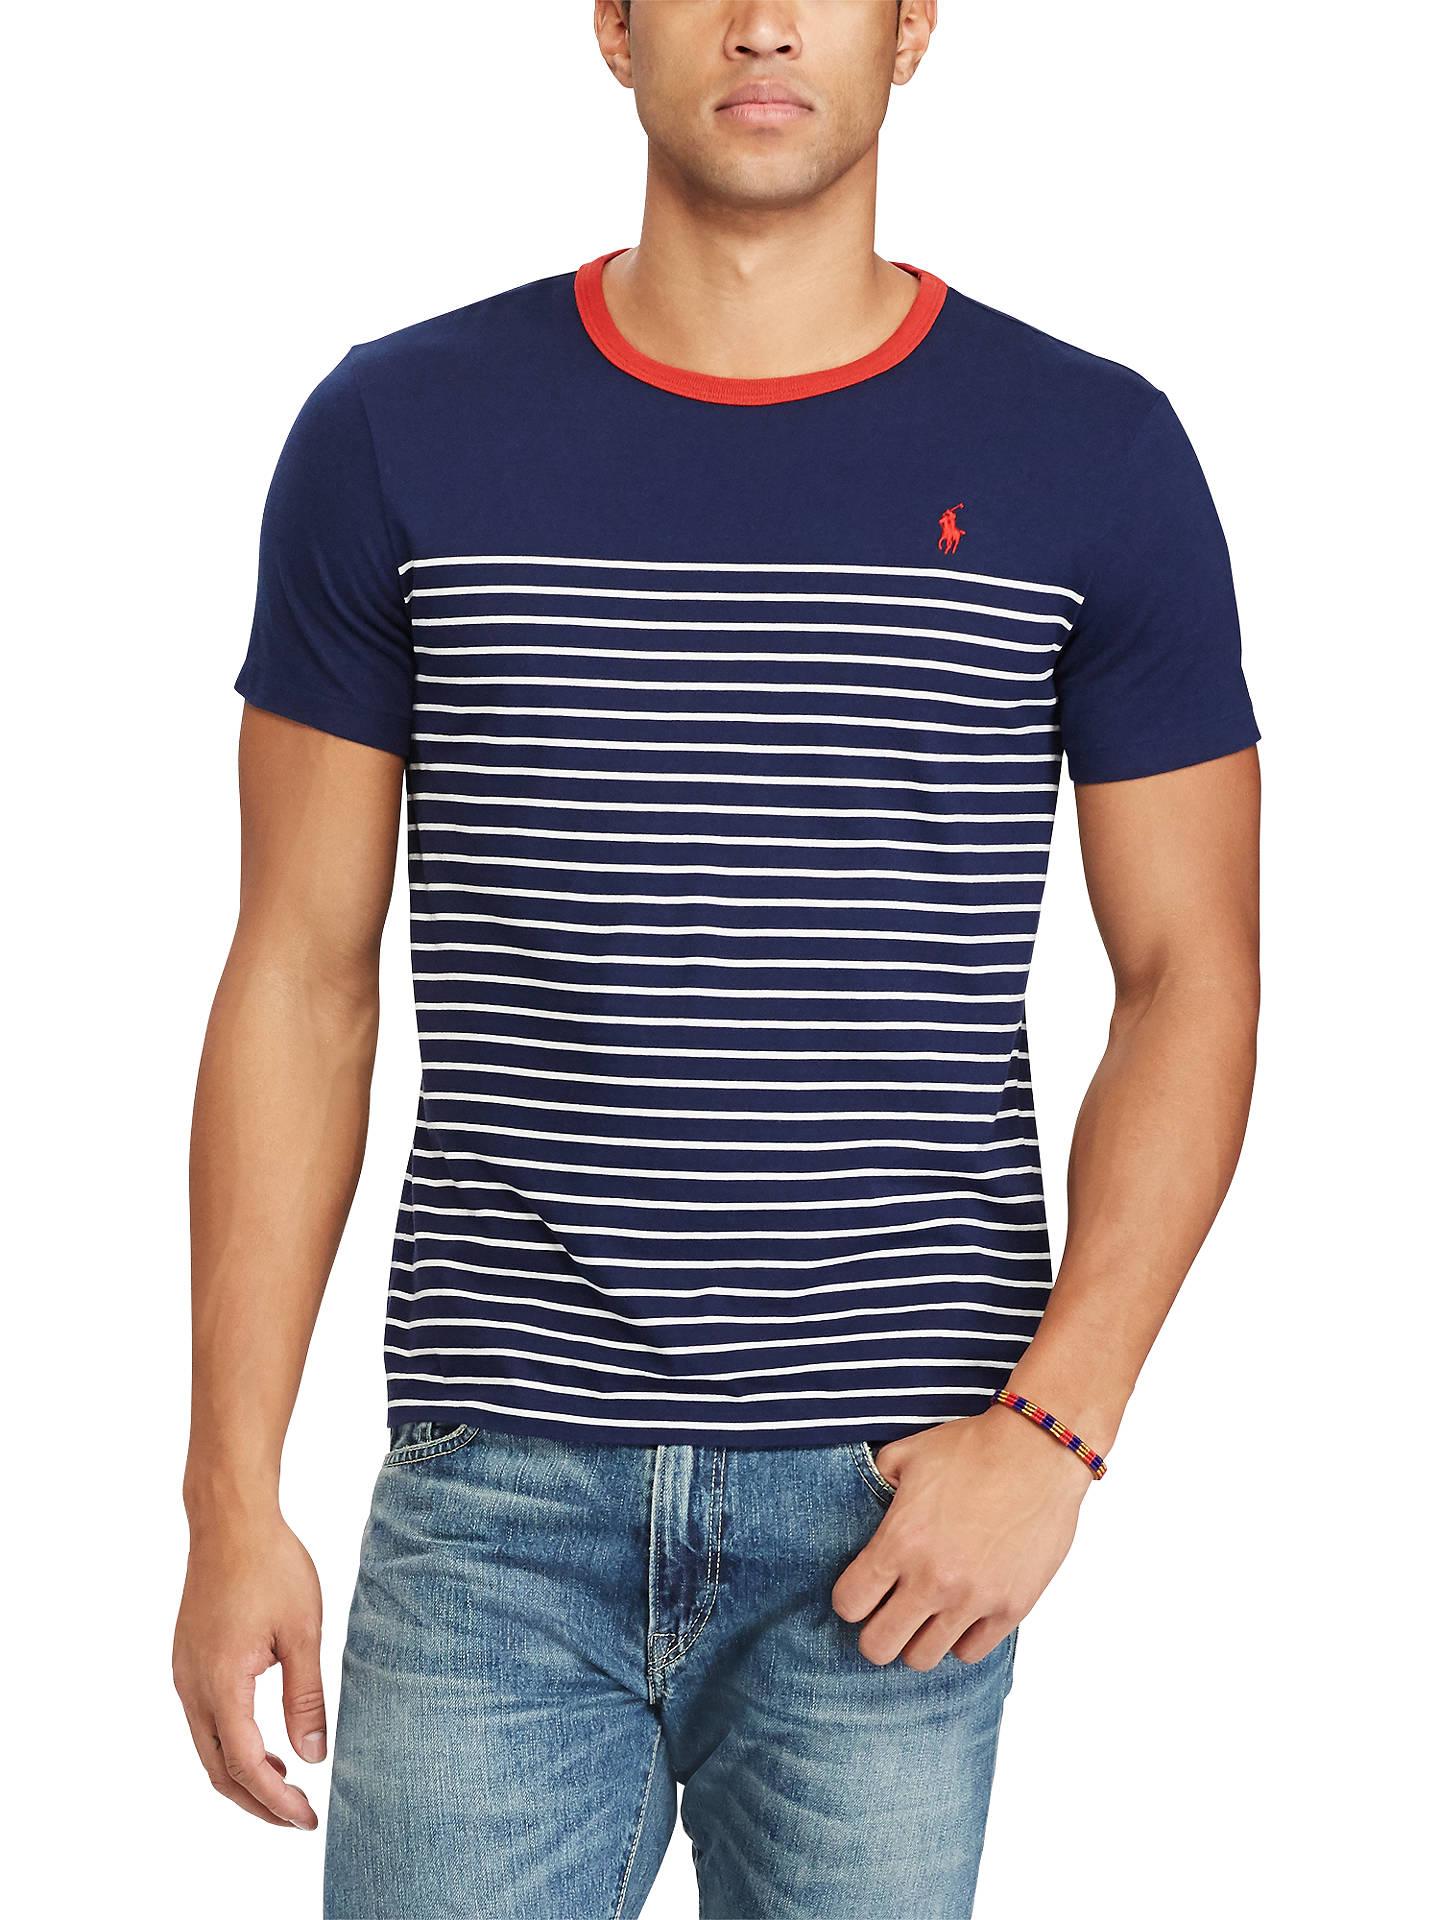 9ff386da Buy Polo Ralph Lauren Custom Slim Fit T-Shirt, Newport Navy/Nevis, ...